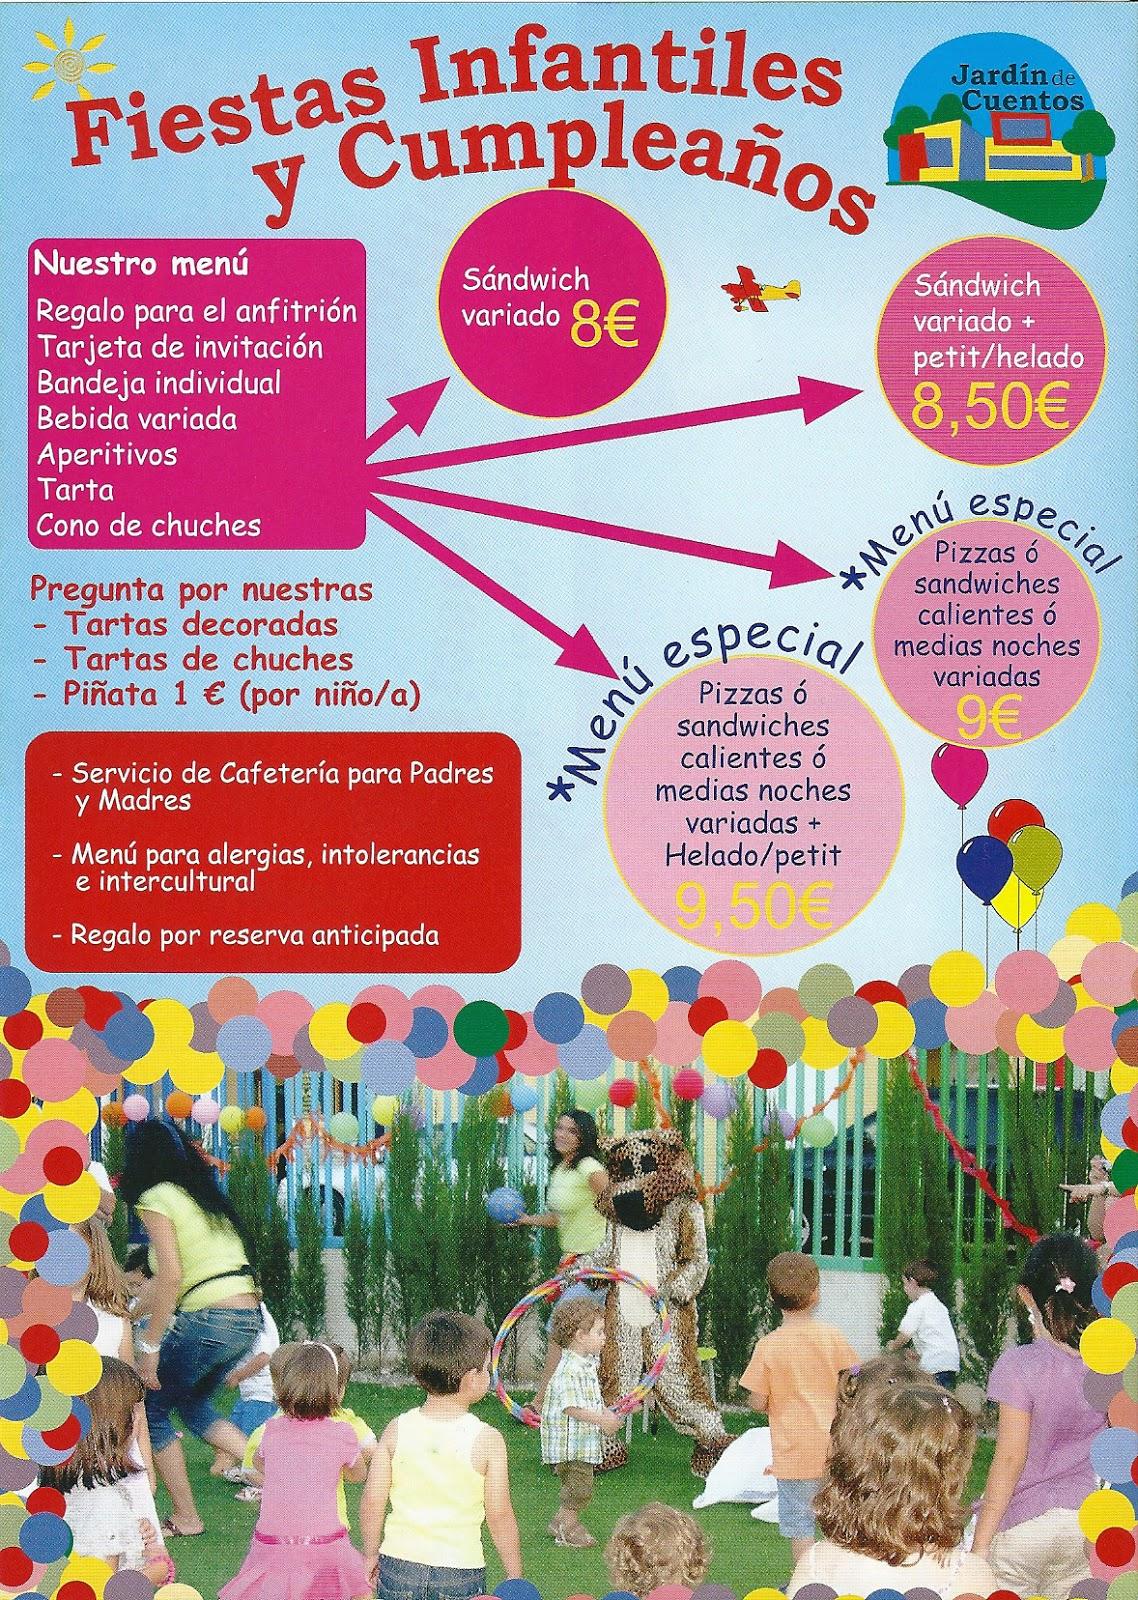 Jardin decuentos fiestas infantiles y cumplea os - Fiesta de cumpleanos infantil ...